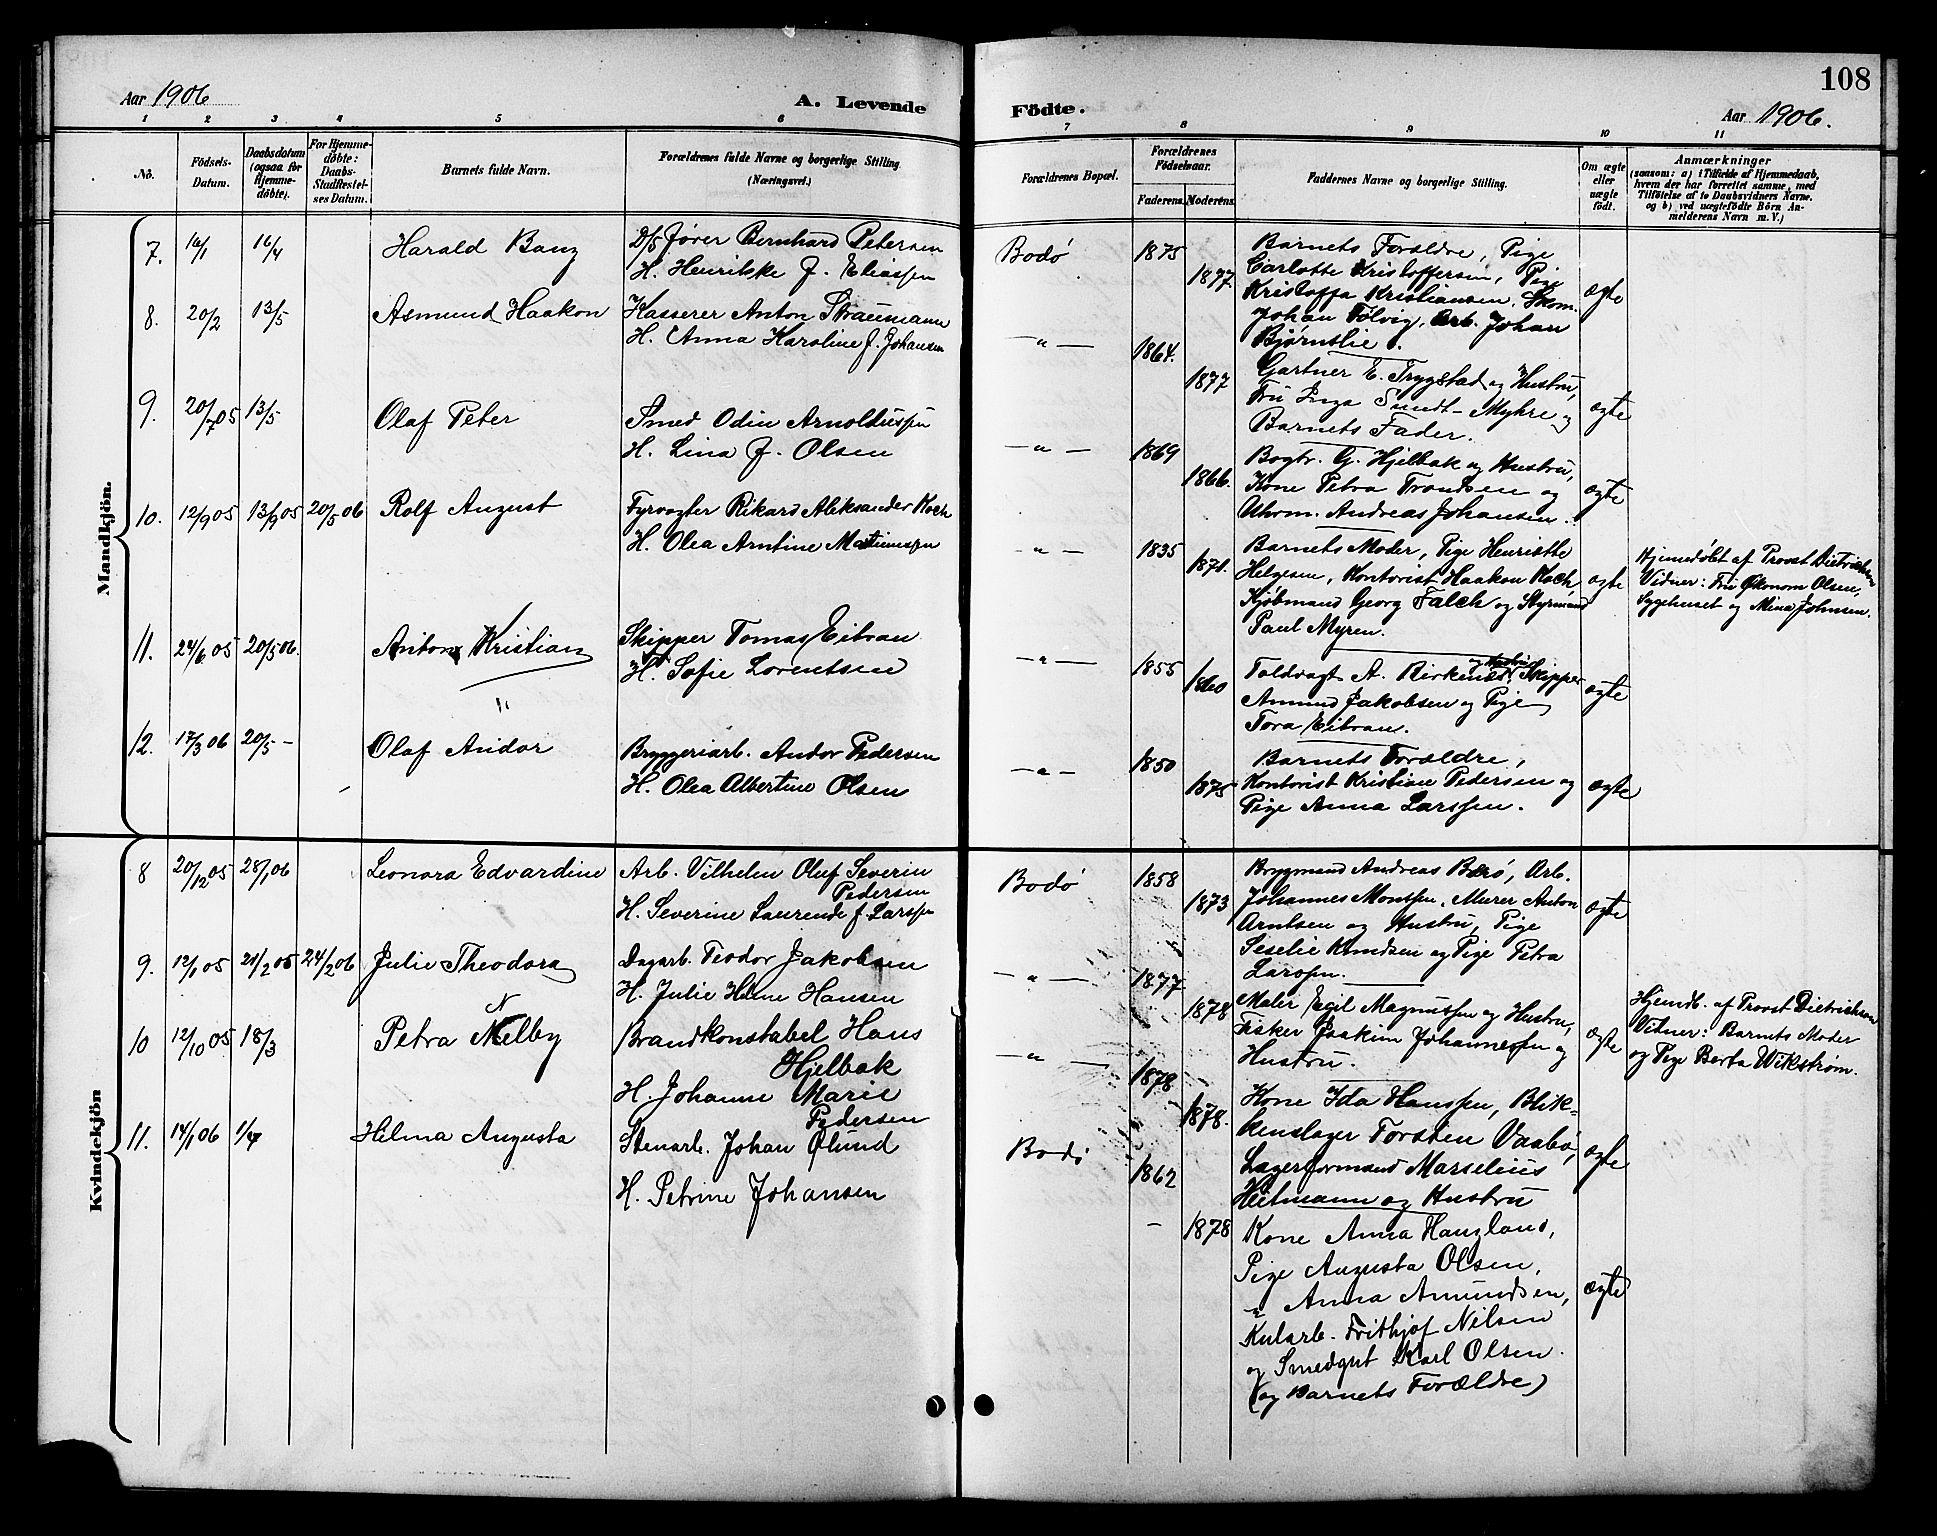 SAT, Ministerialprotokoller, klokkerbøker og fødselsregistre - Nordland, 801/L0033: Klokkerbok nr. 801C08, 1898-1910, s. 108